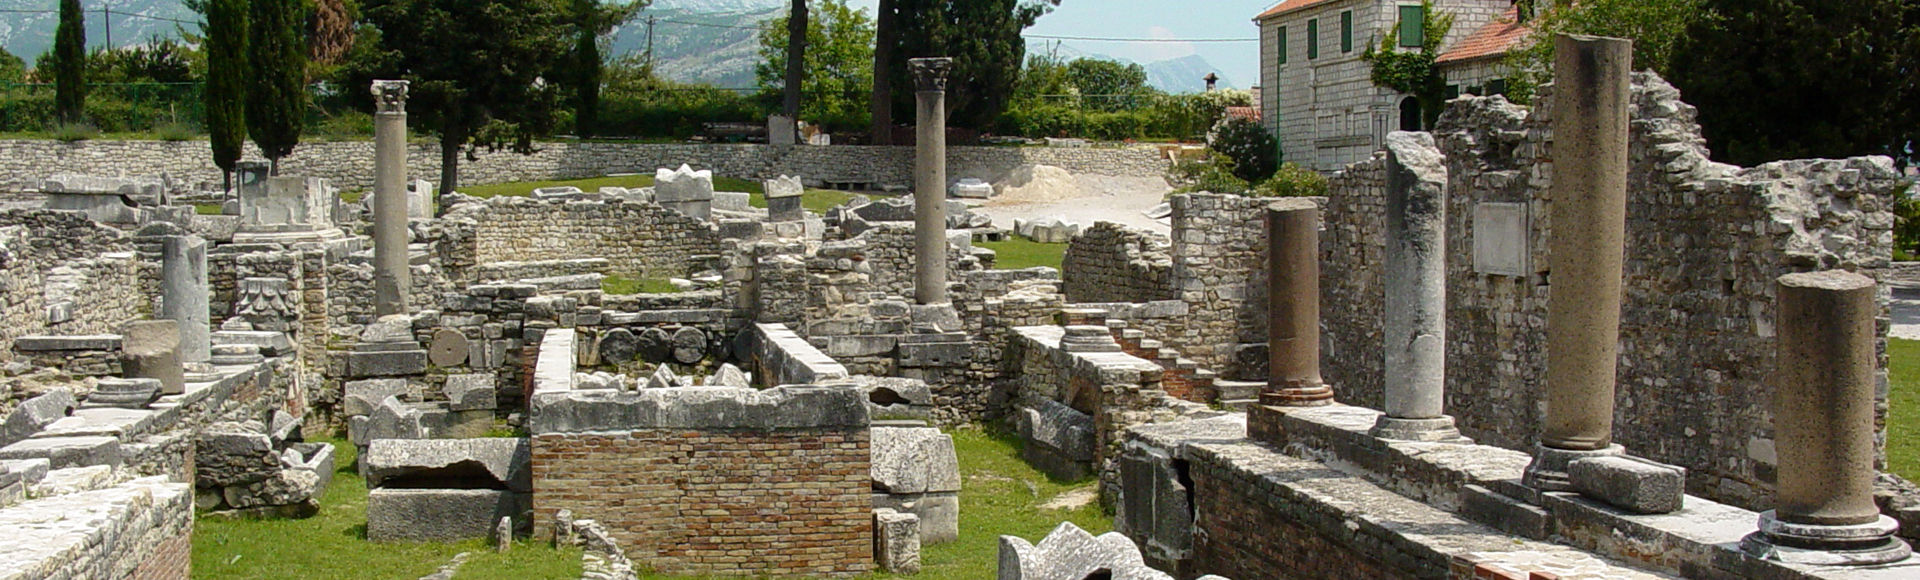 Solin ostaci antičkog doba